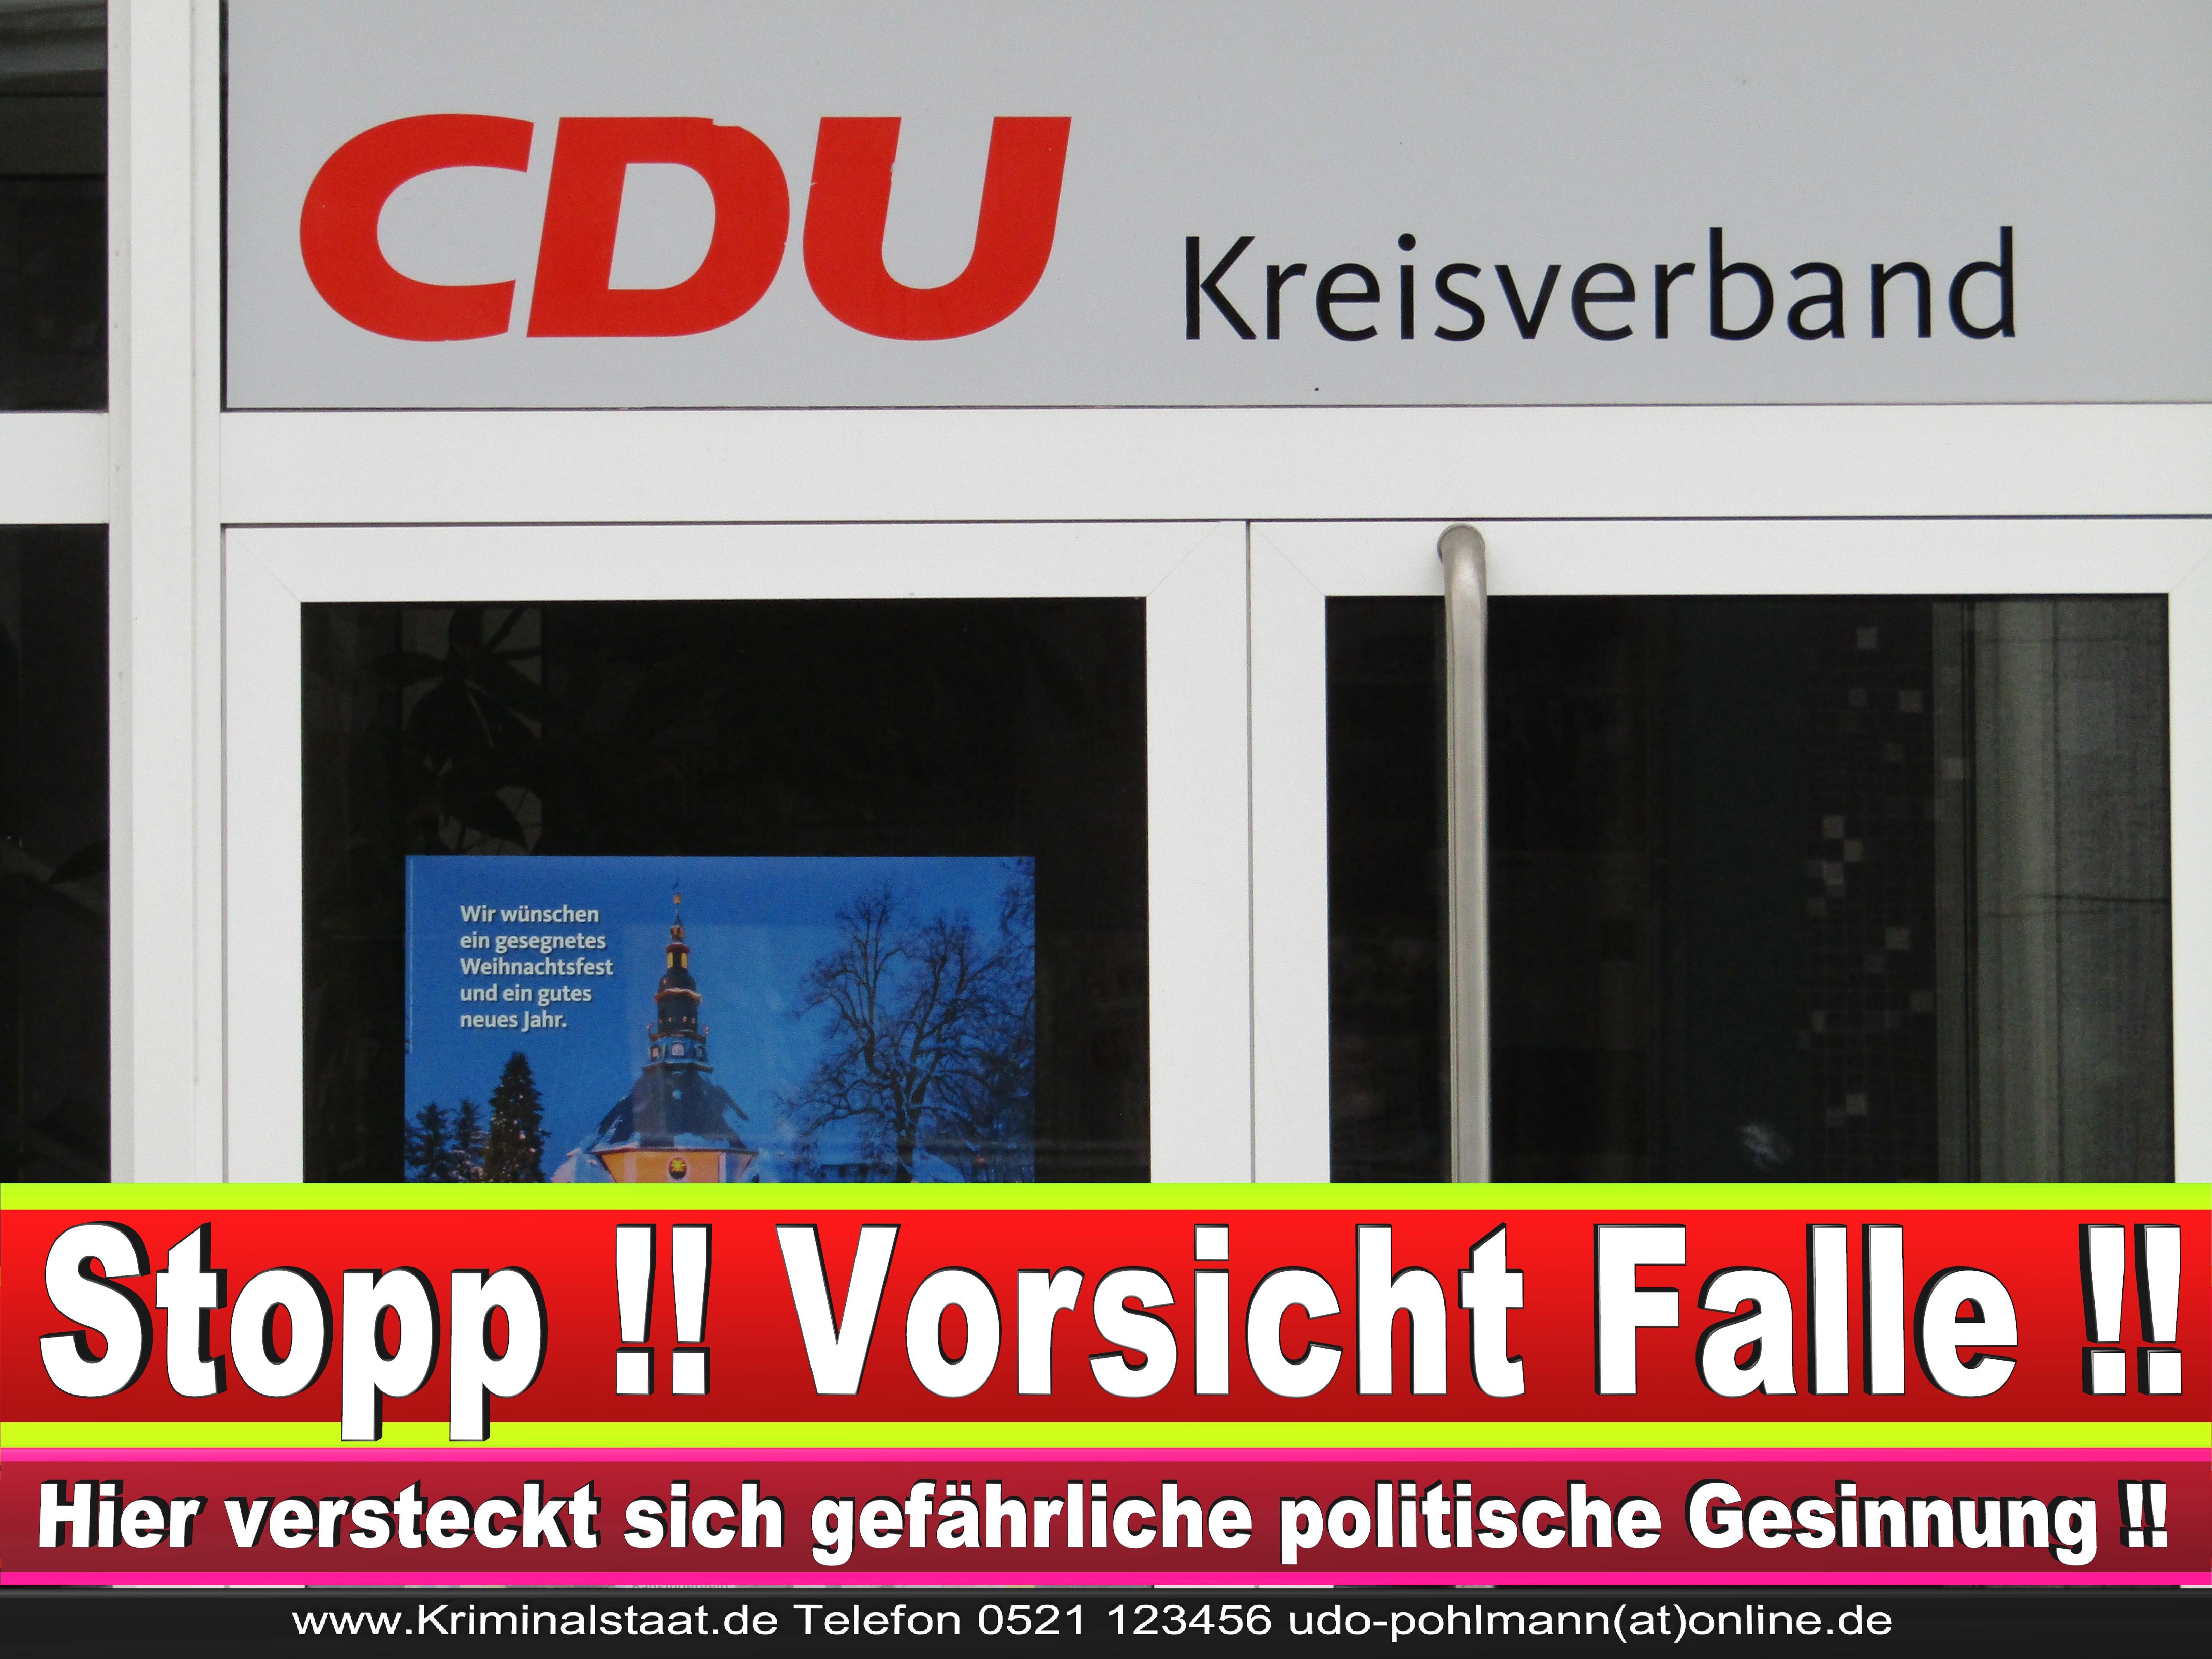 CDU DORTMUND KREISVERBAND BüRGERBüRO CDU FRAKTION ORTSVERBAND CDU NRW GESCHäFTSSTELLE ADRESSE RATSMITGLIEDER CDU (26) 1